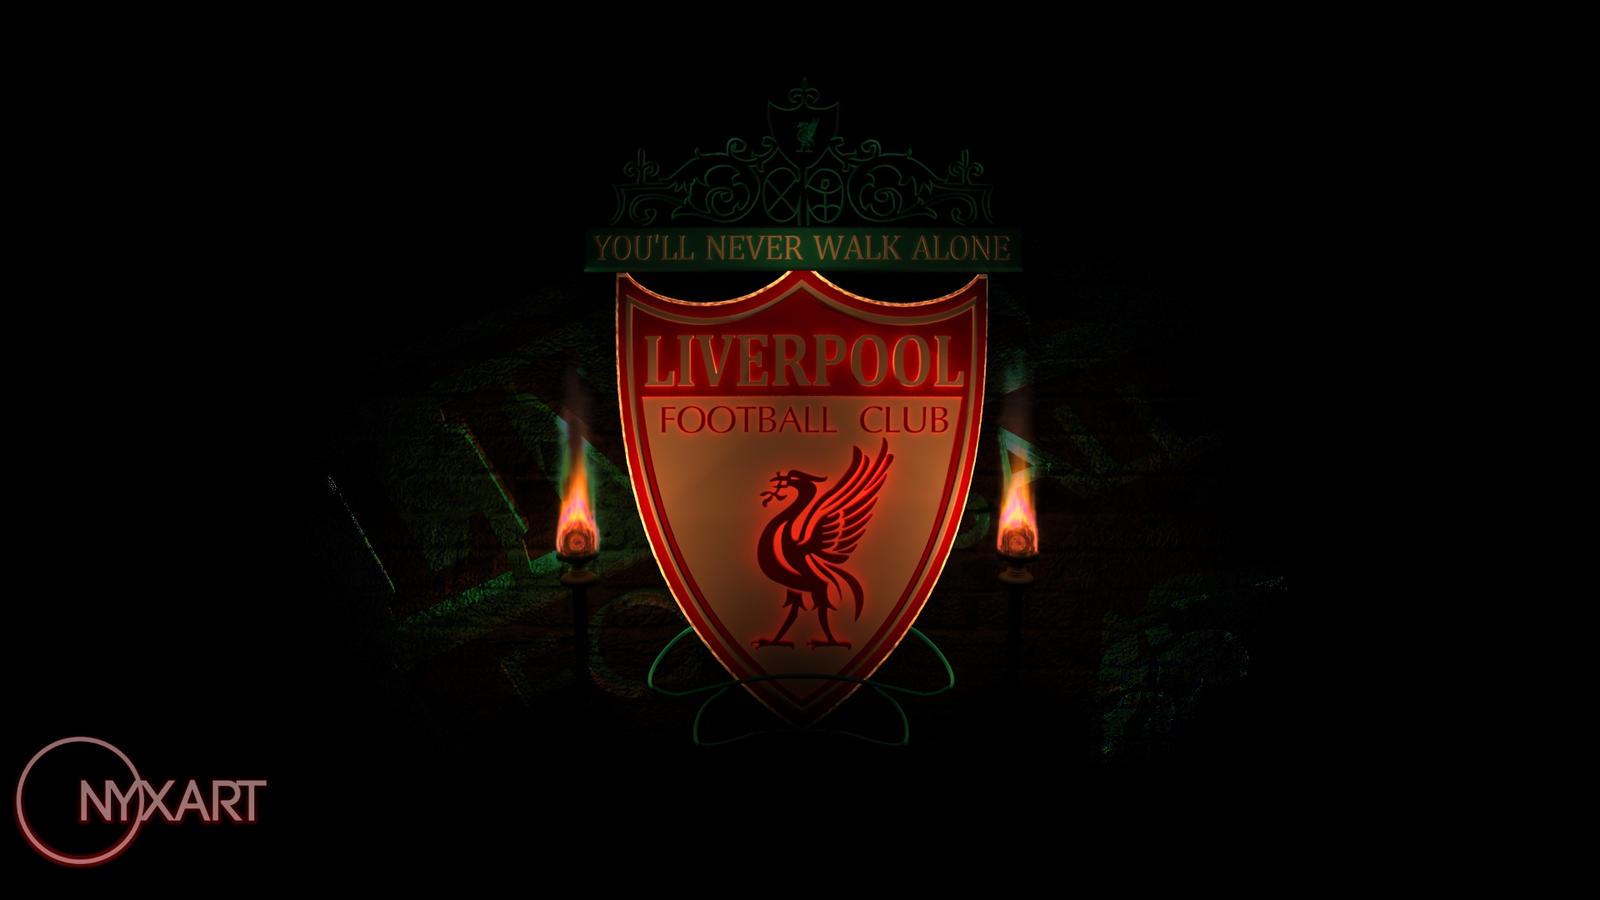 Liverpool Fc Logo Wallpaper By Jc Tuman On Deviantart